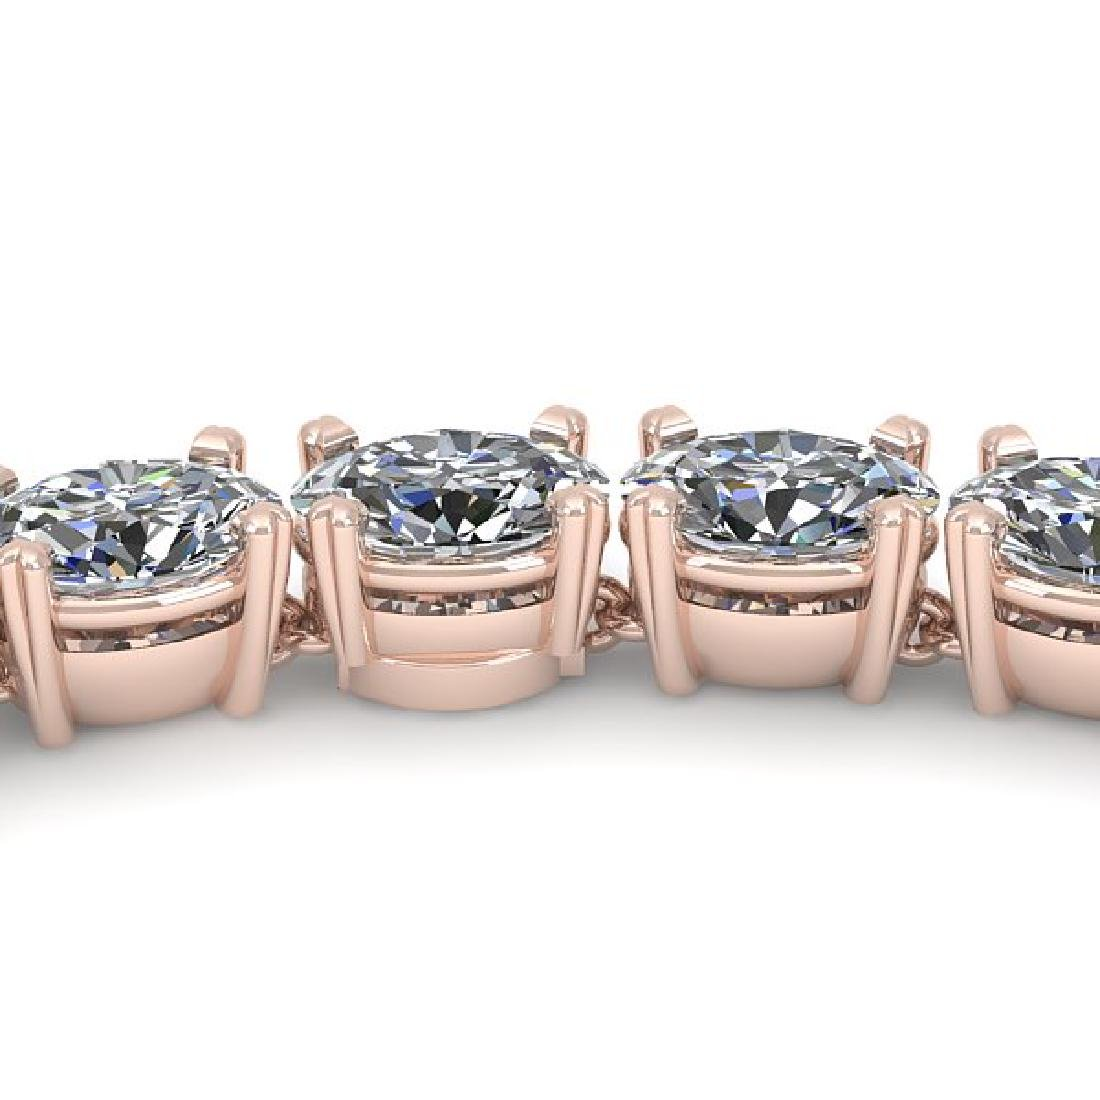 26 CTW Oval Cut Certified SI Diamond Necklace 18K Rose